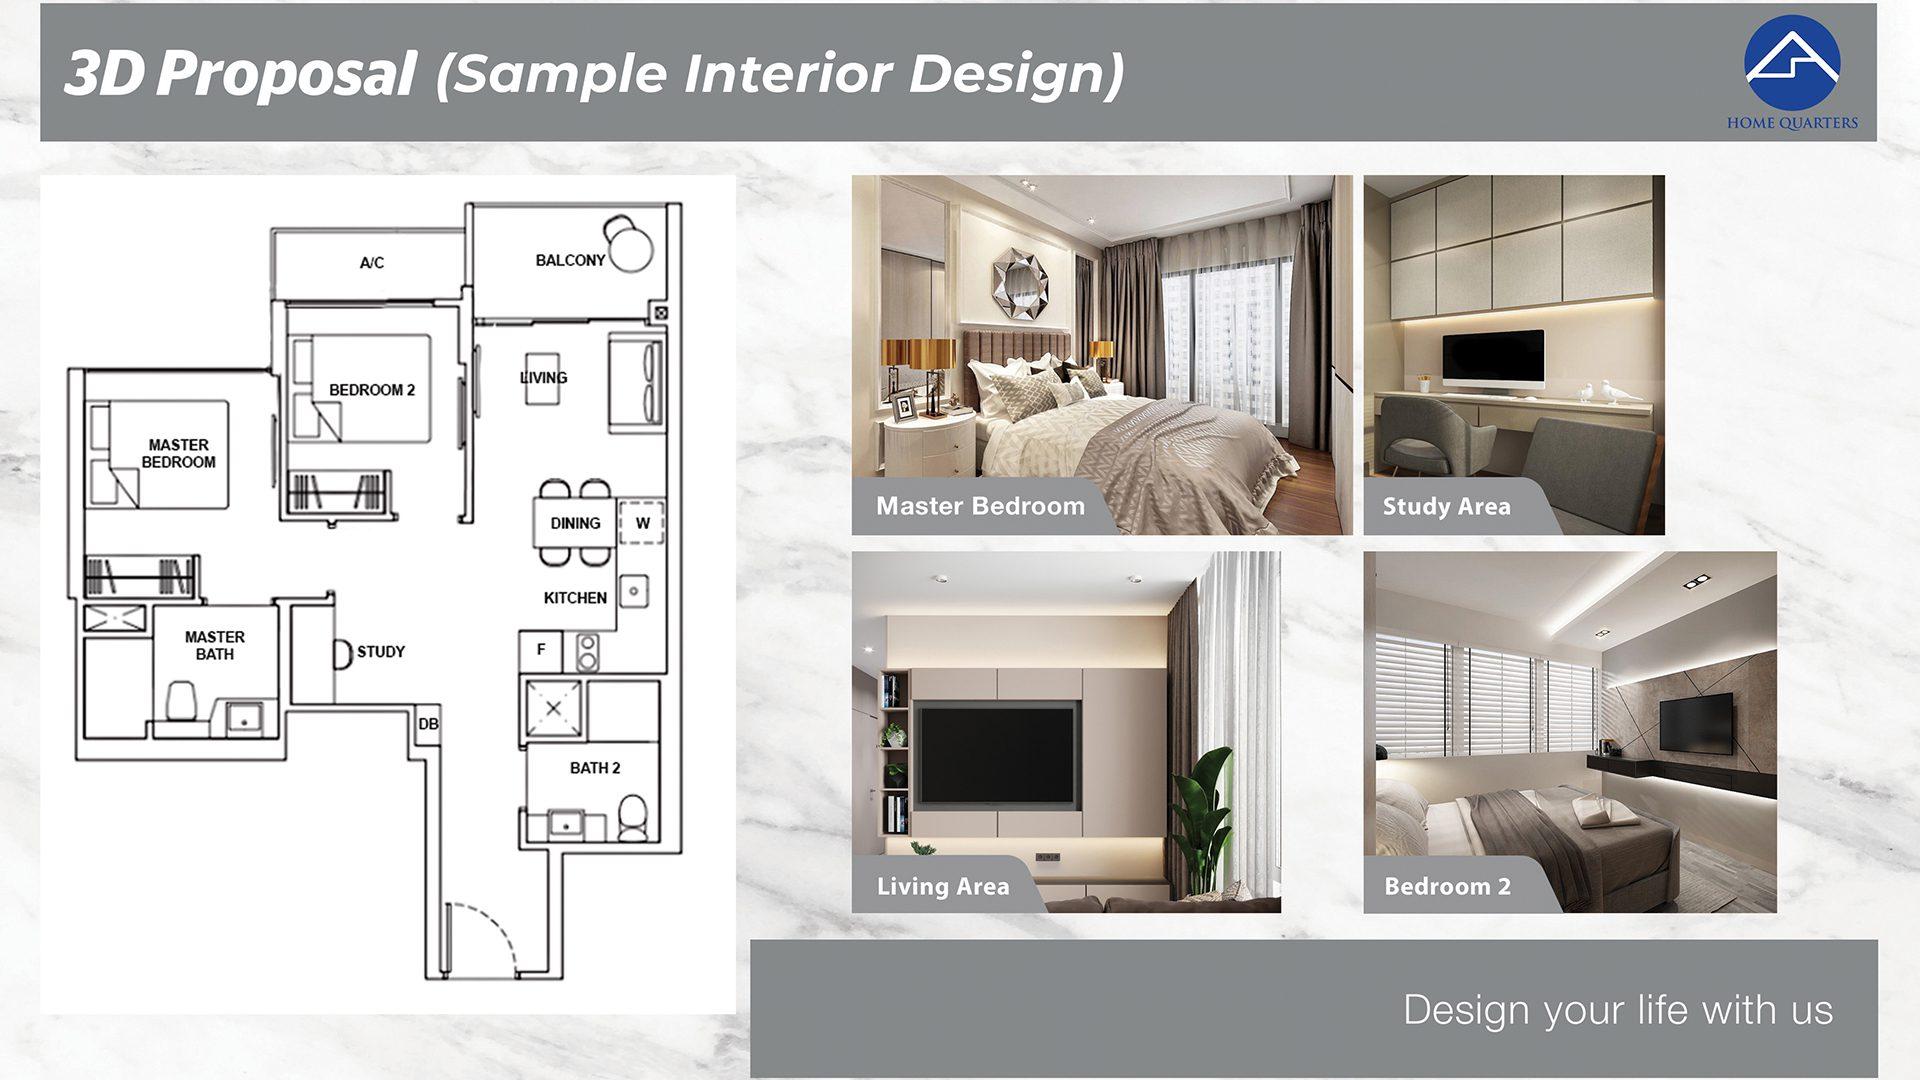 3D-Proposal1920x1080_Grandeur-Park-Residences_Home-Quarters-SG_KC-Ng-Keng-Chong.jpg